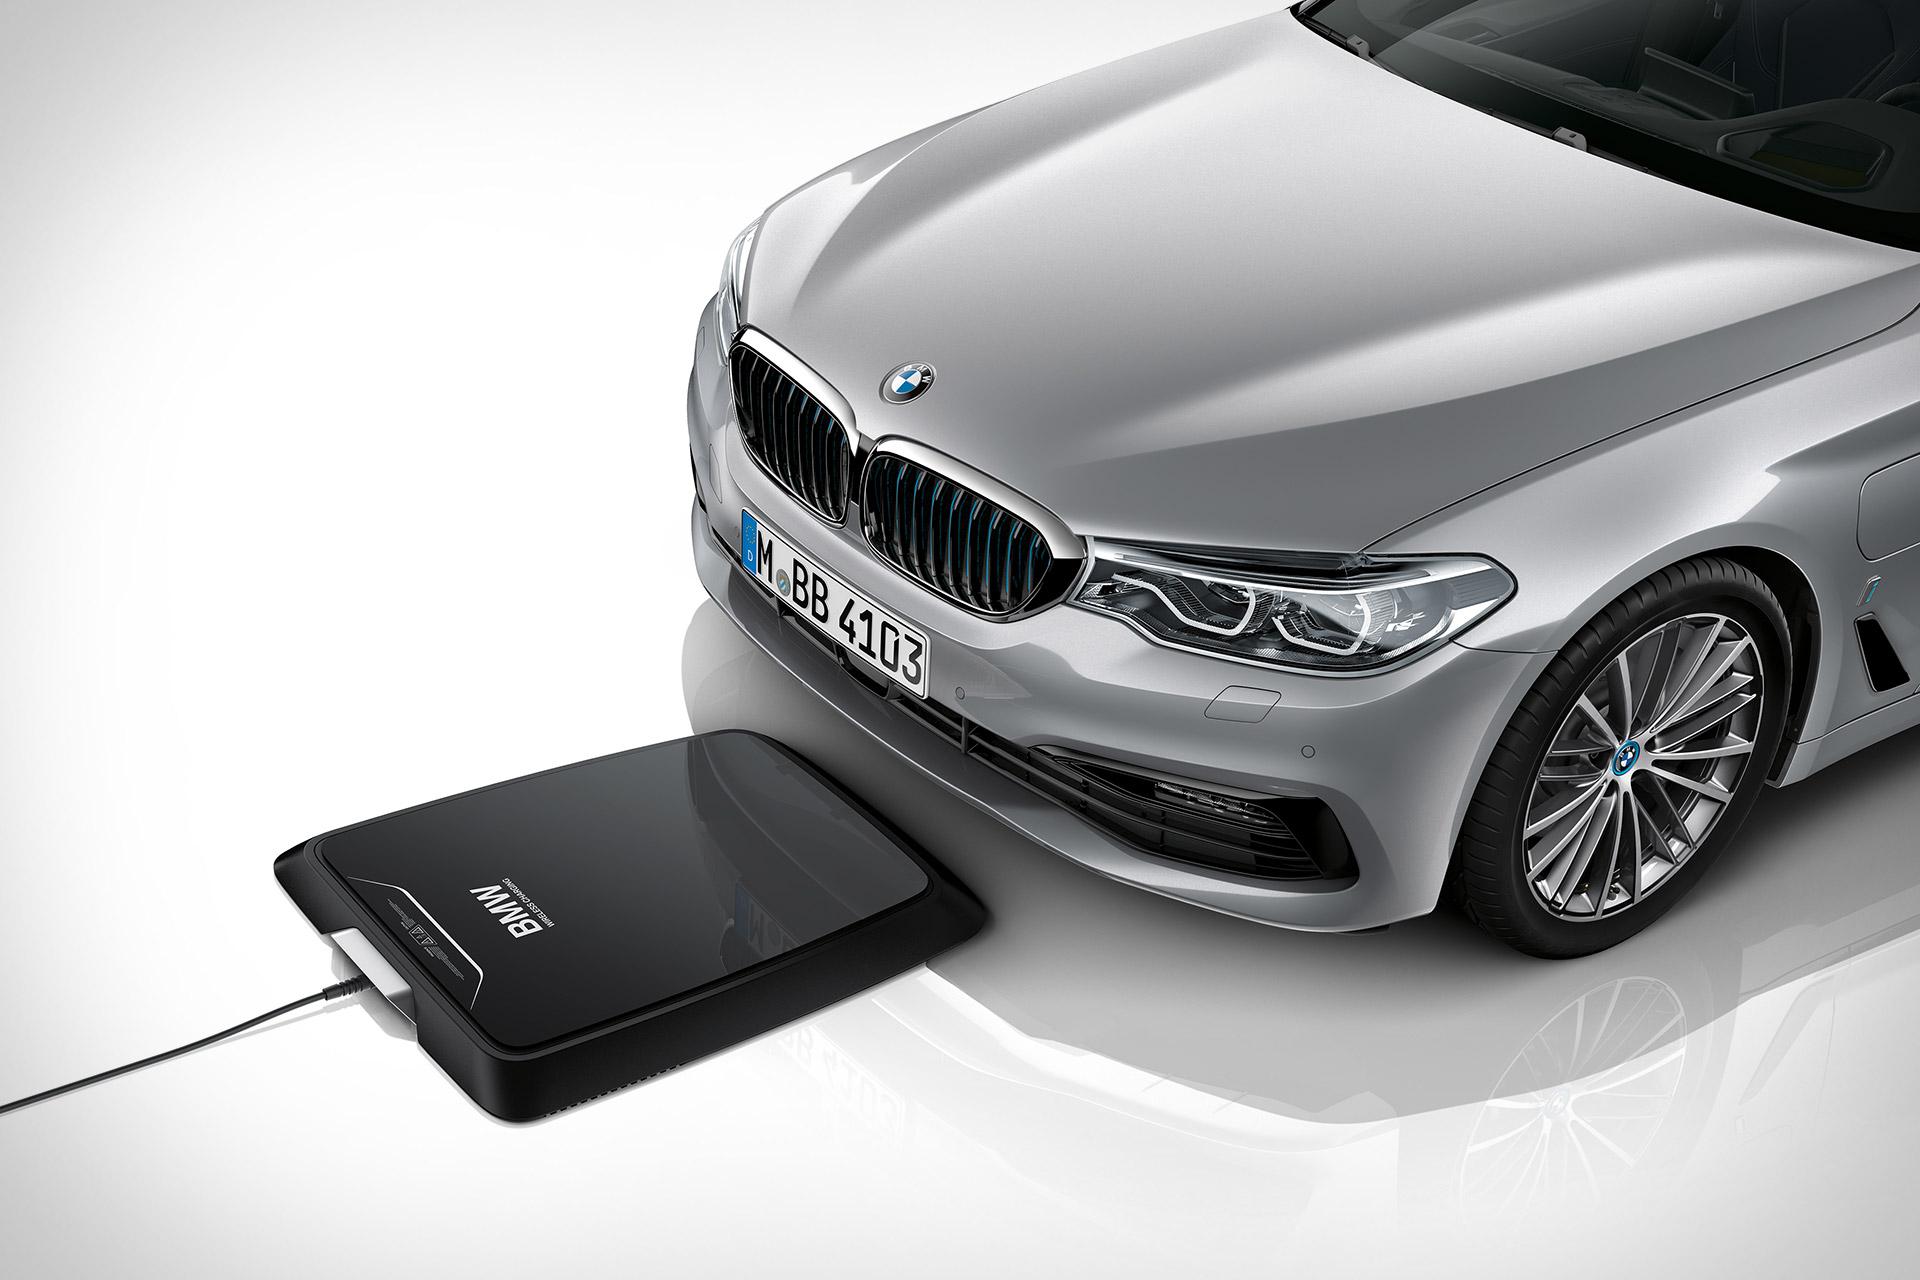 BMW-wireless-charging-station-1.jpg